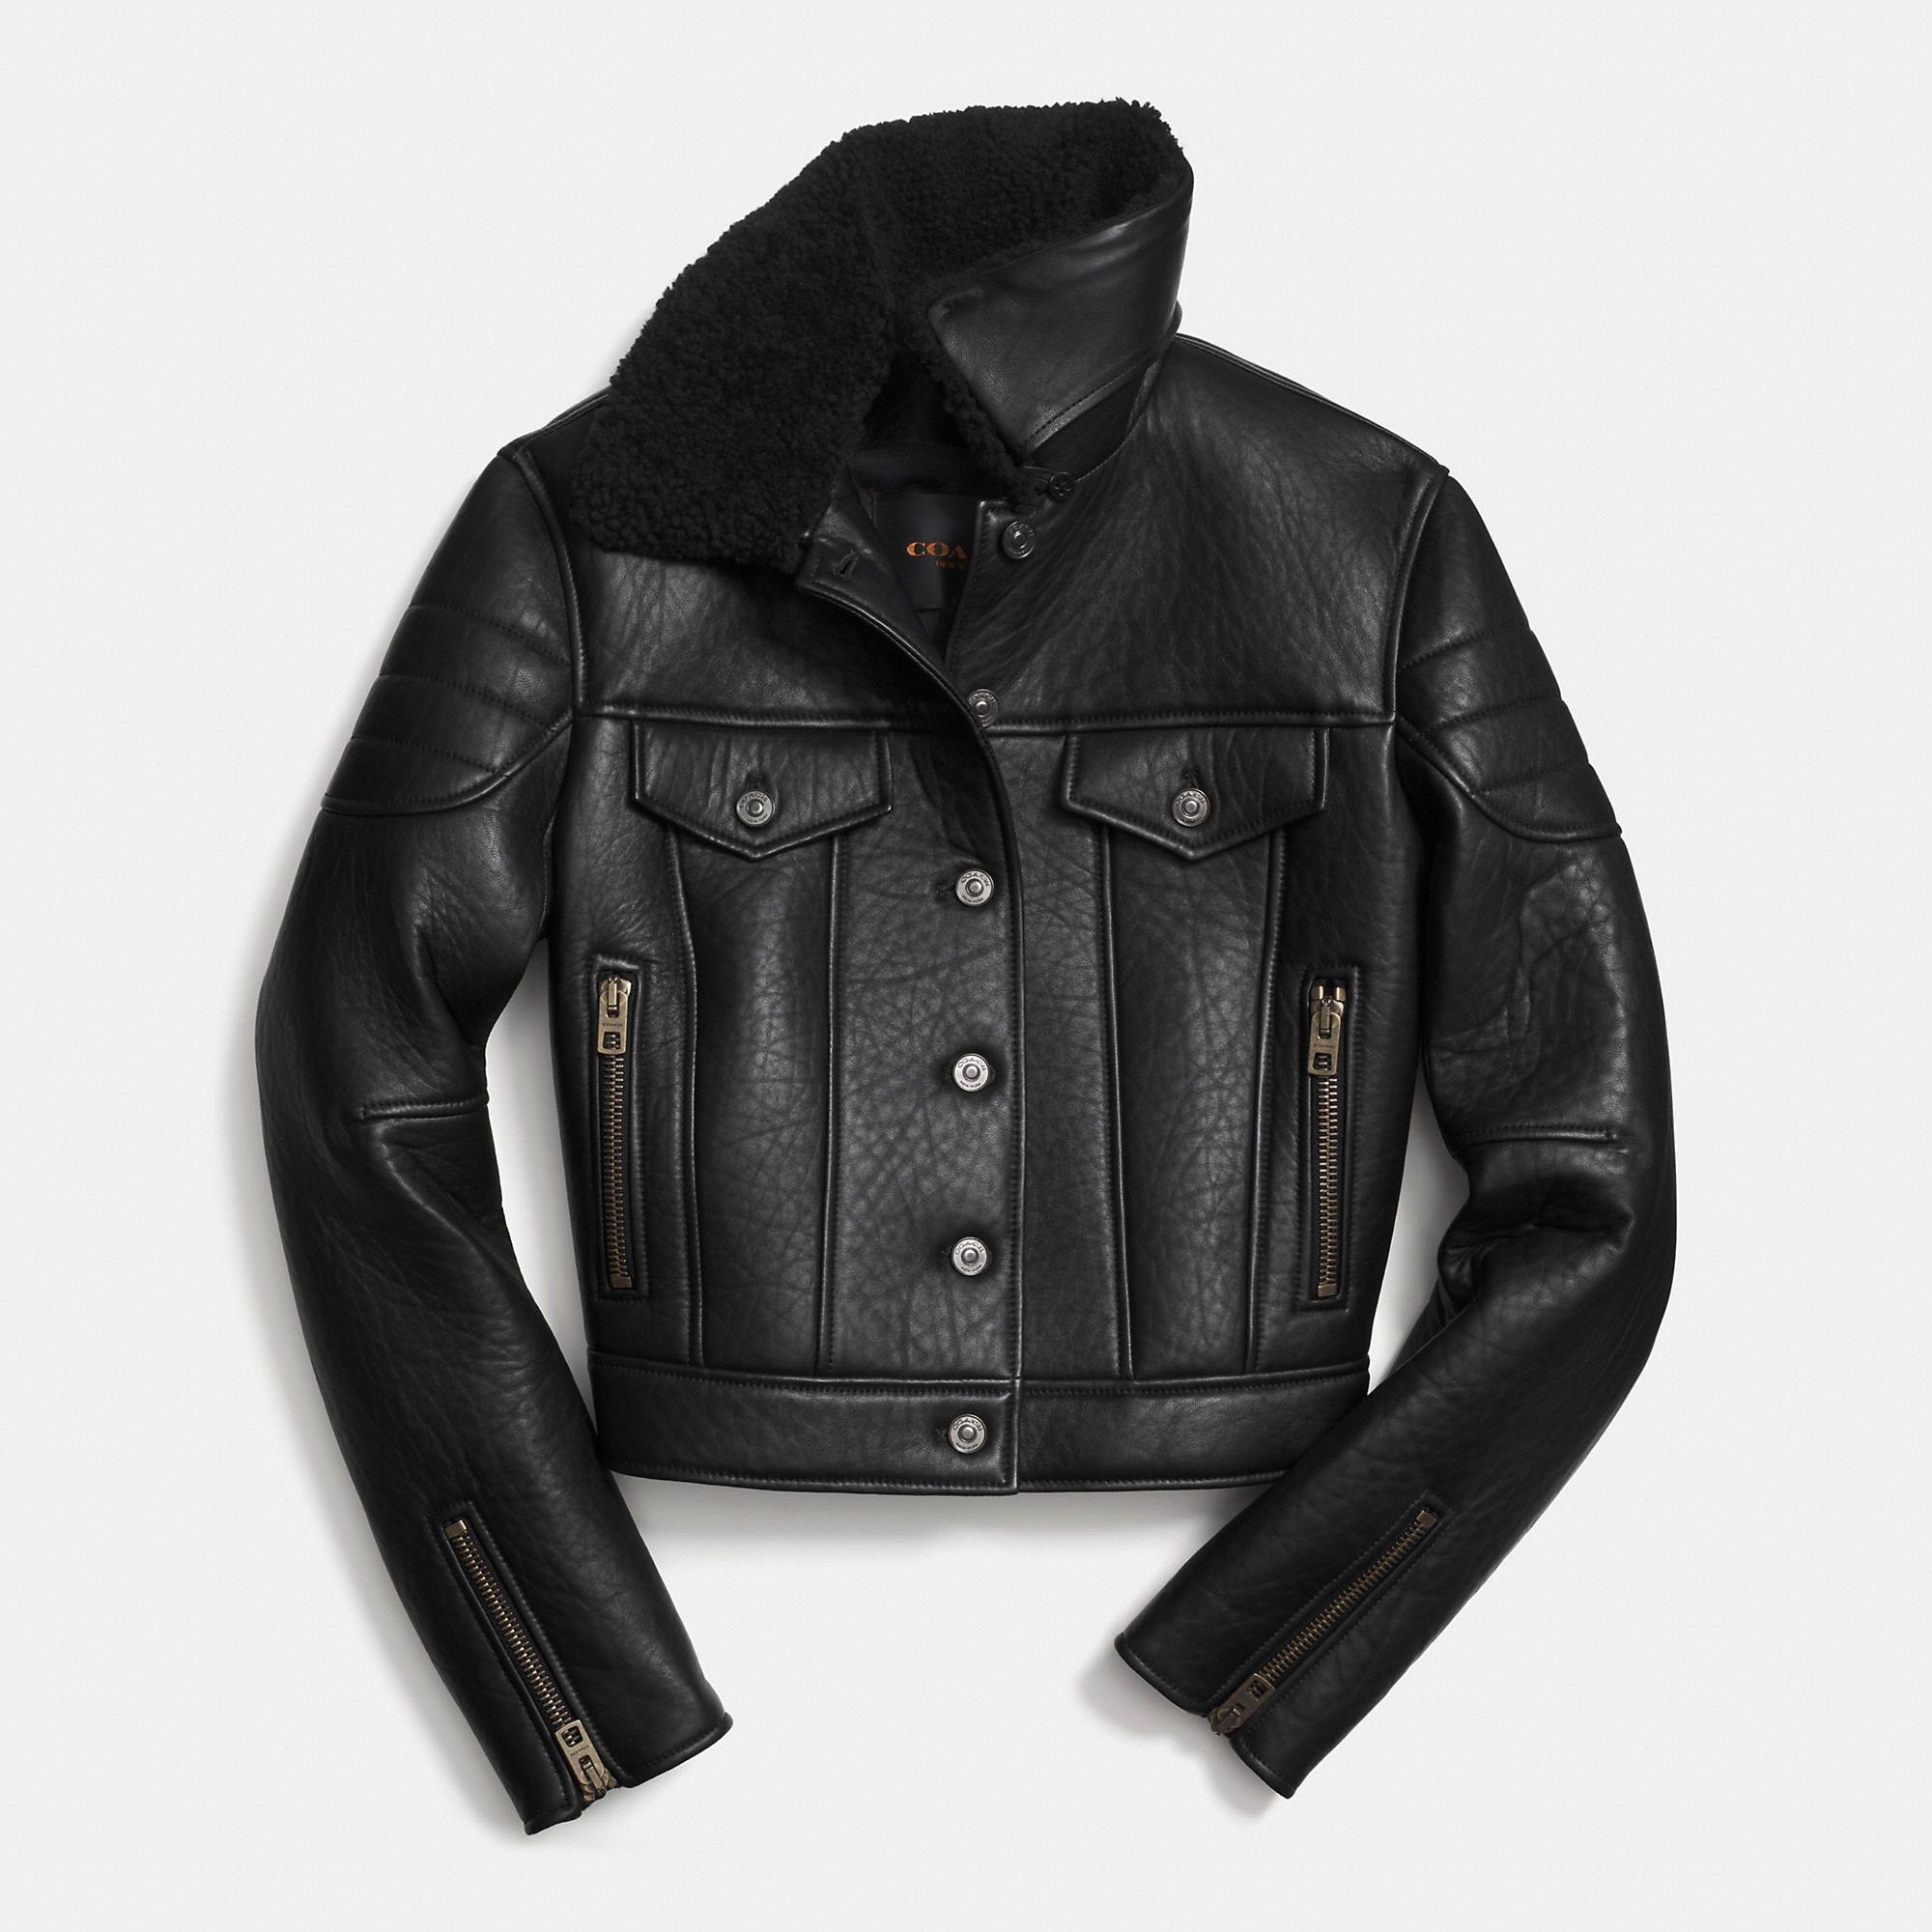 Coach Fall 2014 Leather Biker Jacket Leather jacket